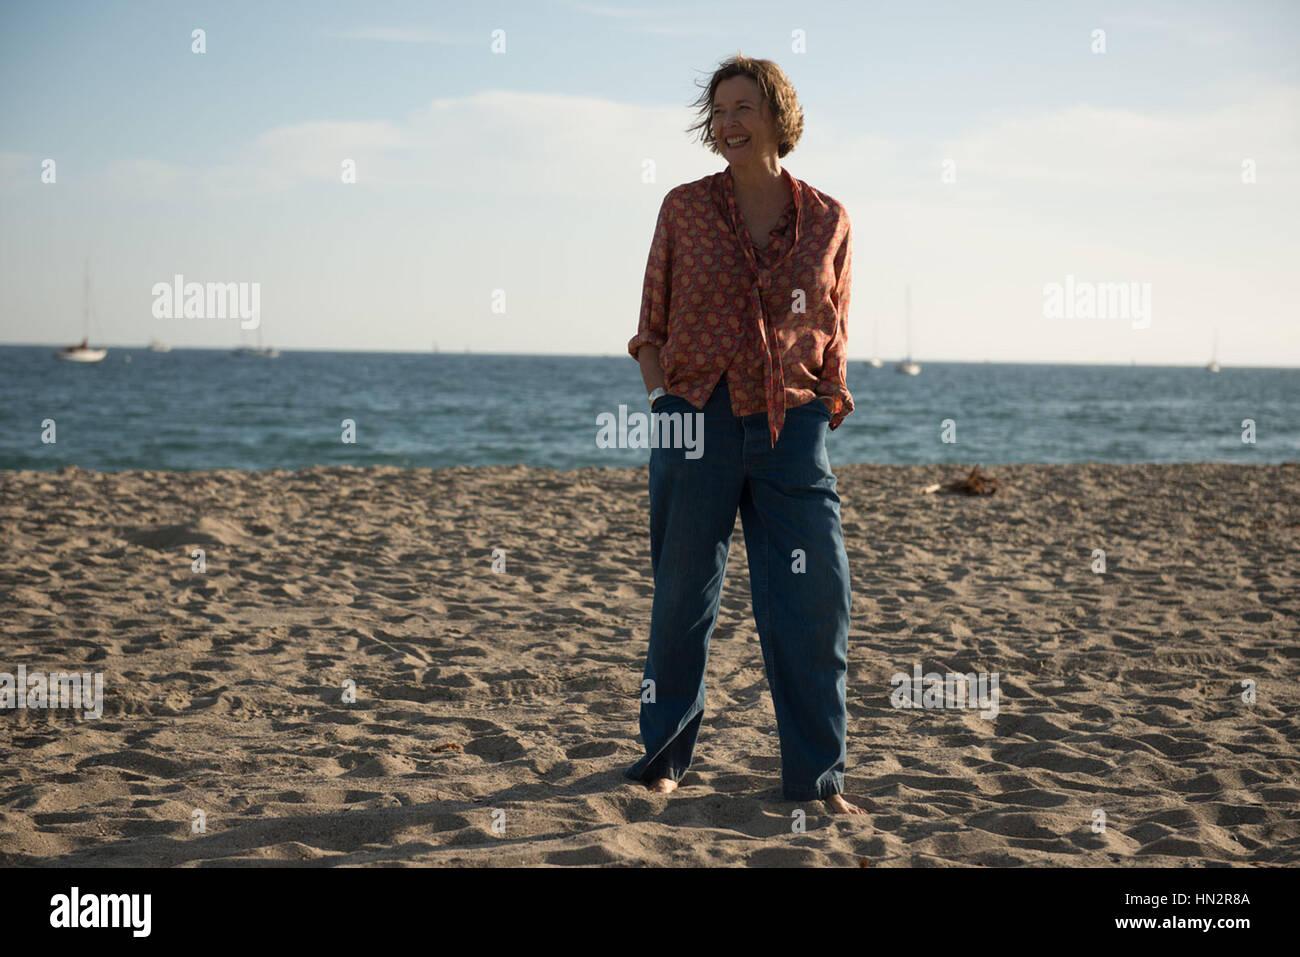 Las mujeres del siglo XX (2016) Annette Bening Mike Mills (dir) annapurna pictures/moviestore colección ltd Imagen De Stock